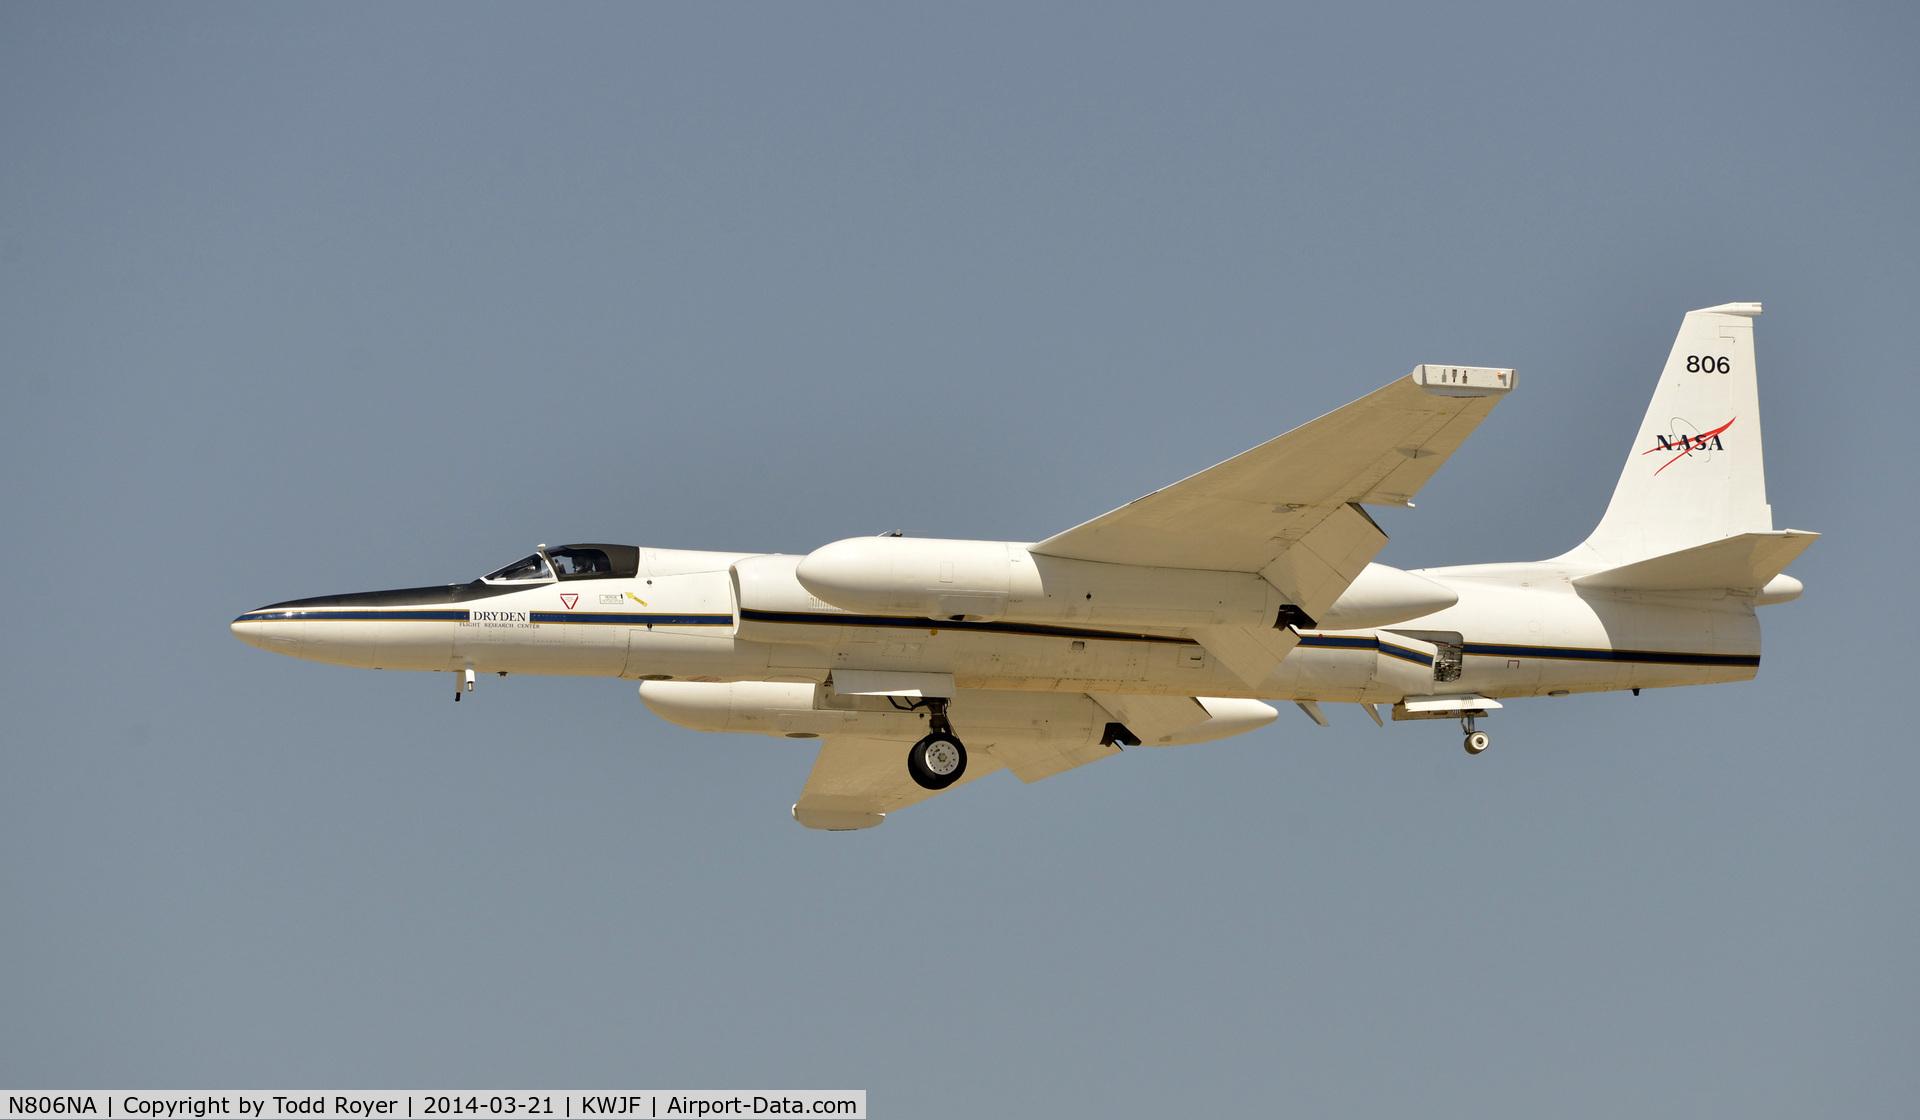 N806NA, Lockheed ER-2 C/N 063, Flying at the Los Angeles County Airshow